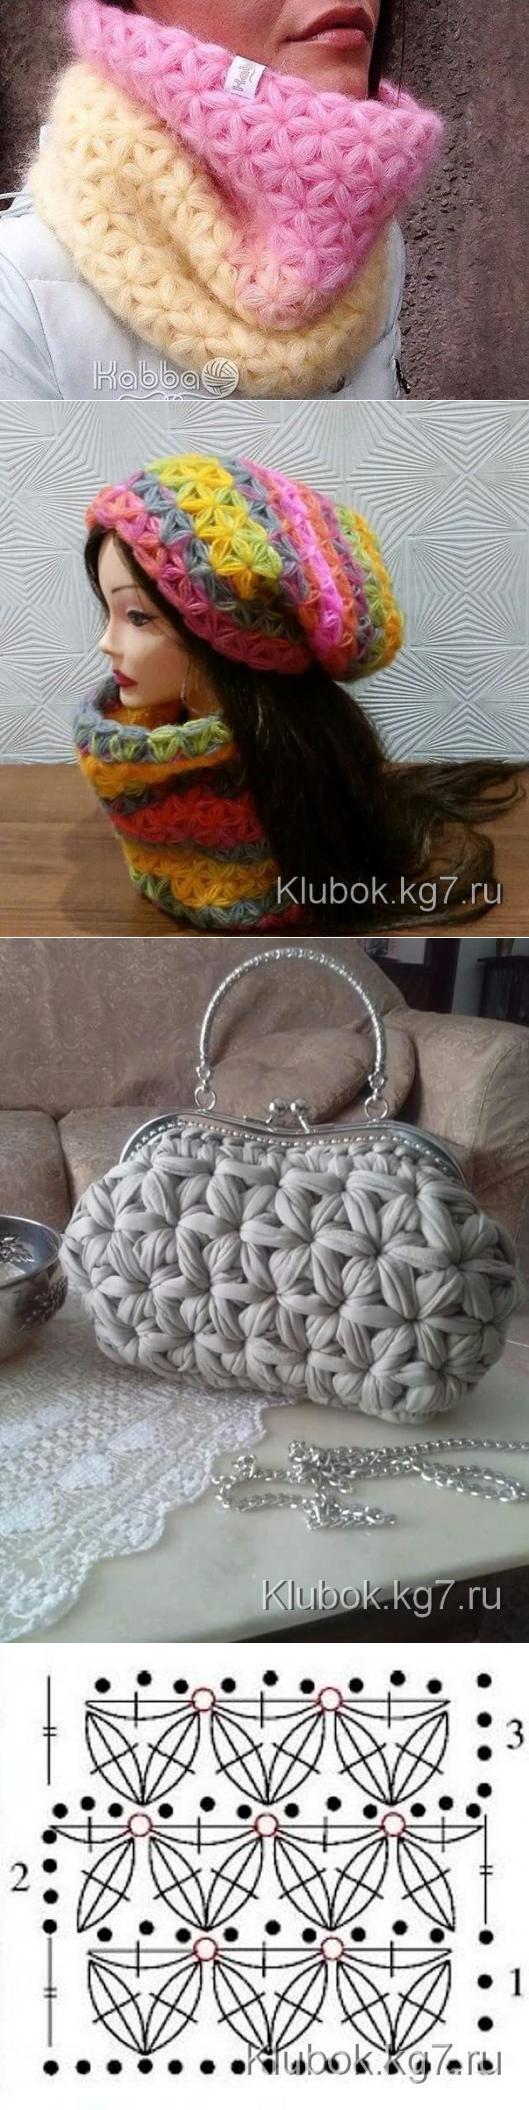 ee54995b4fa3 Вязание крючком для женщин | Tejido de punto | 가방 и 매듭